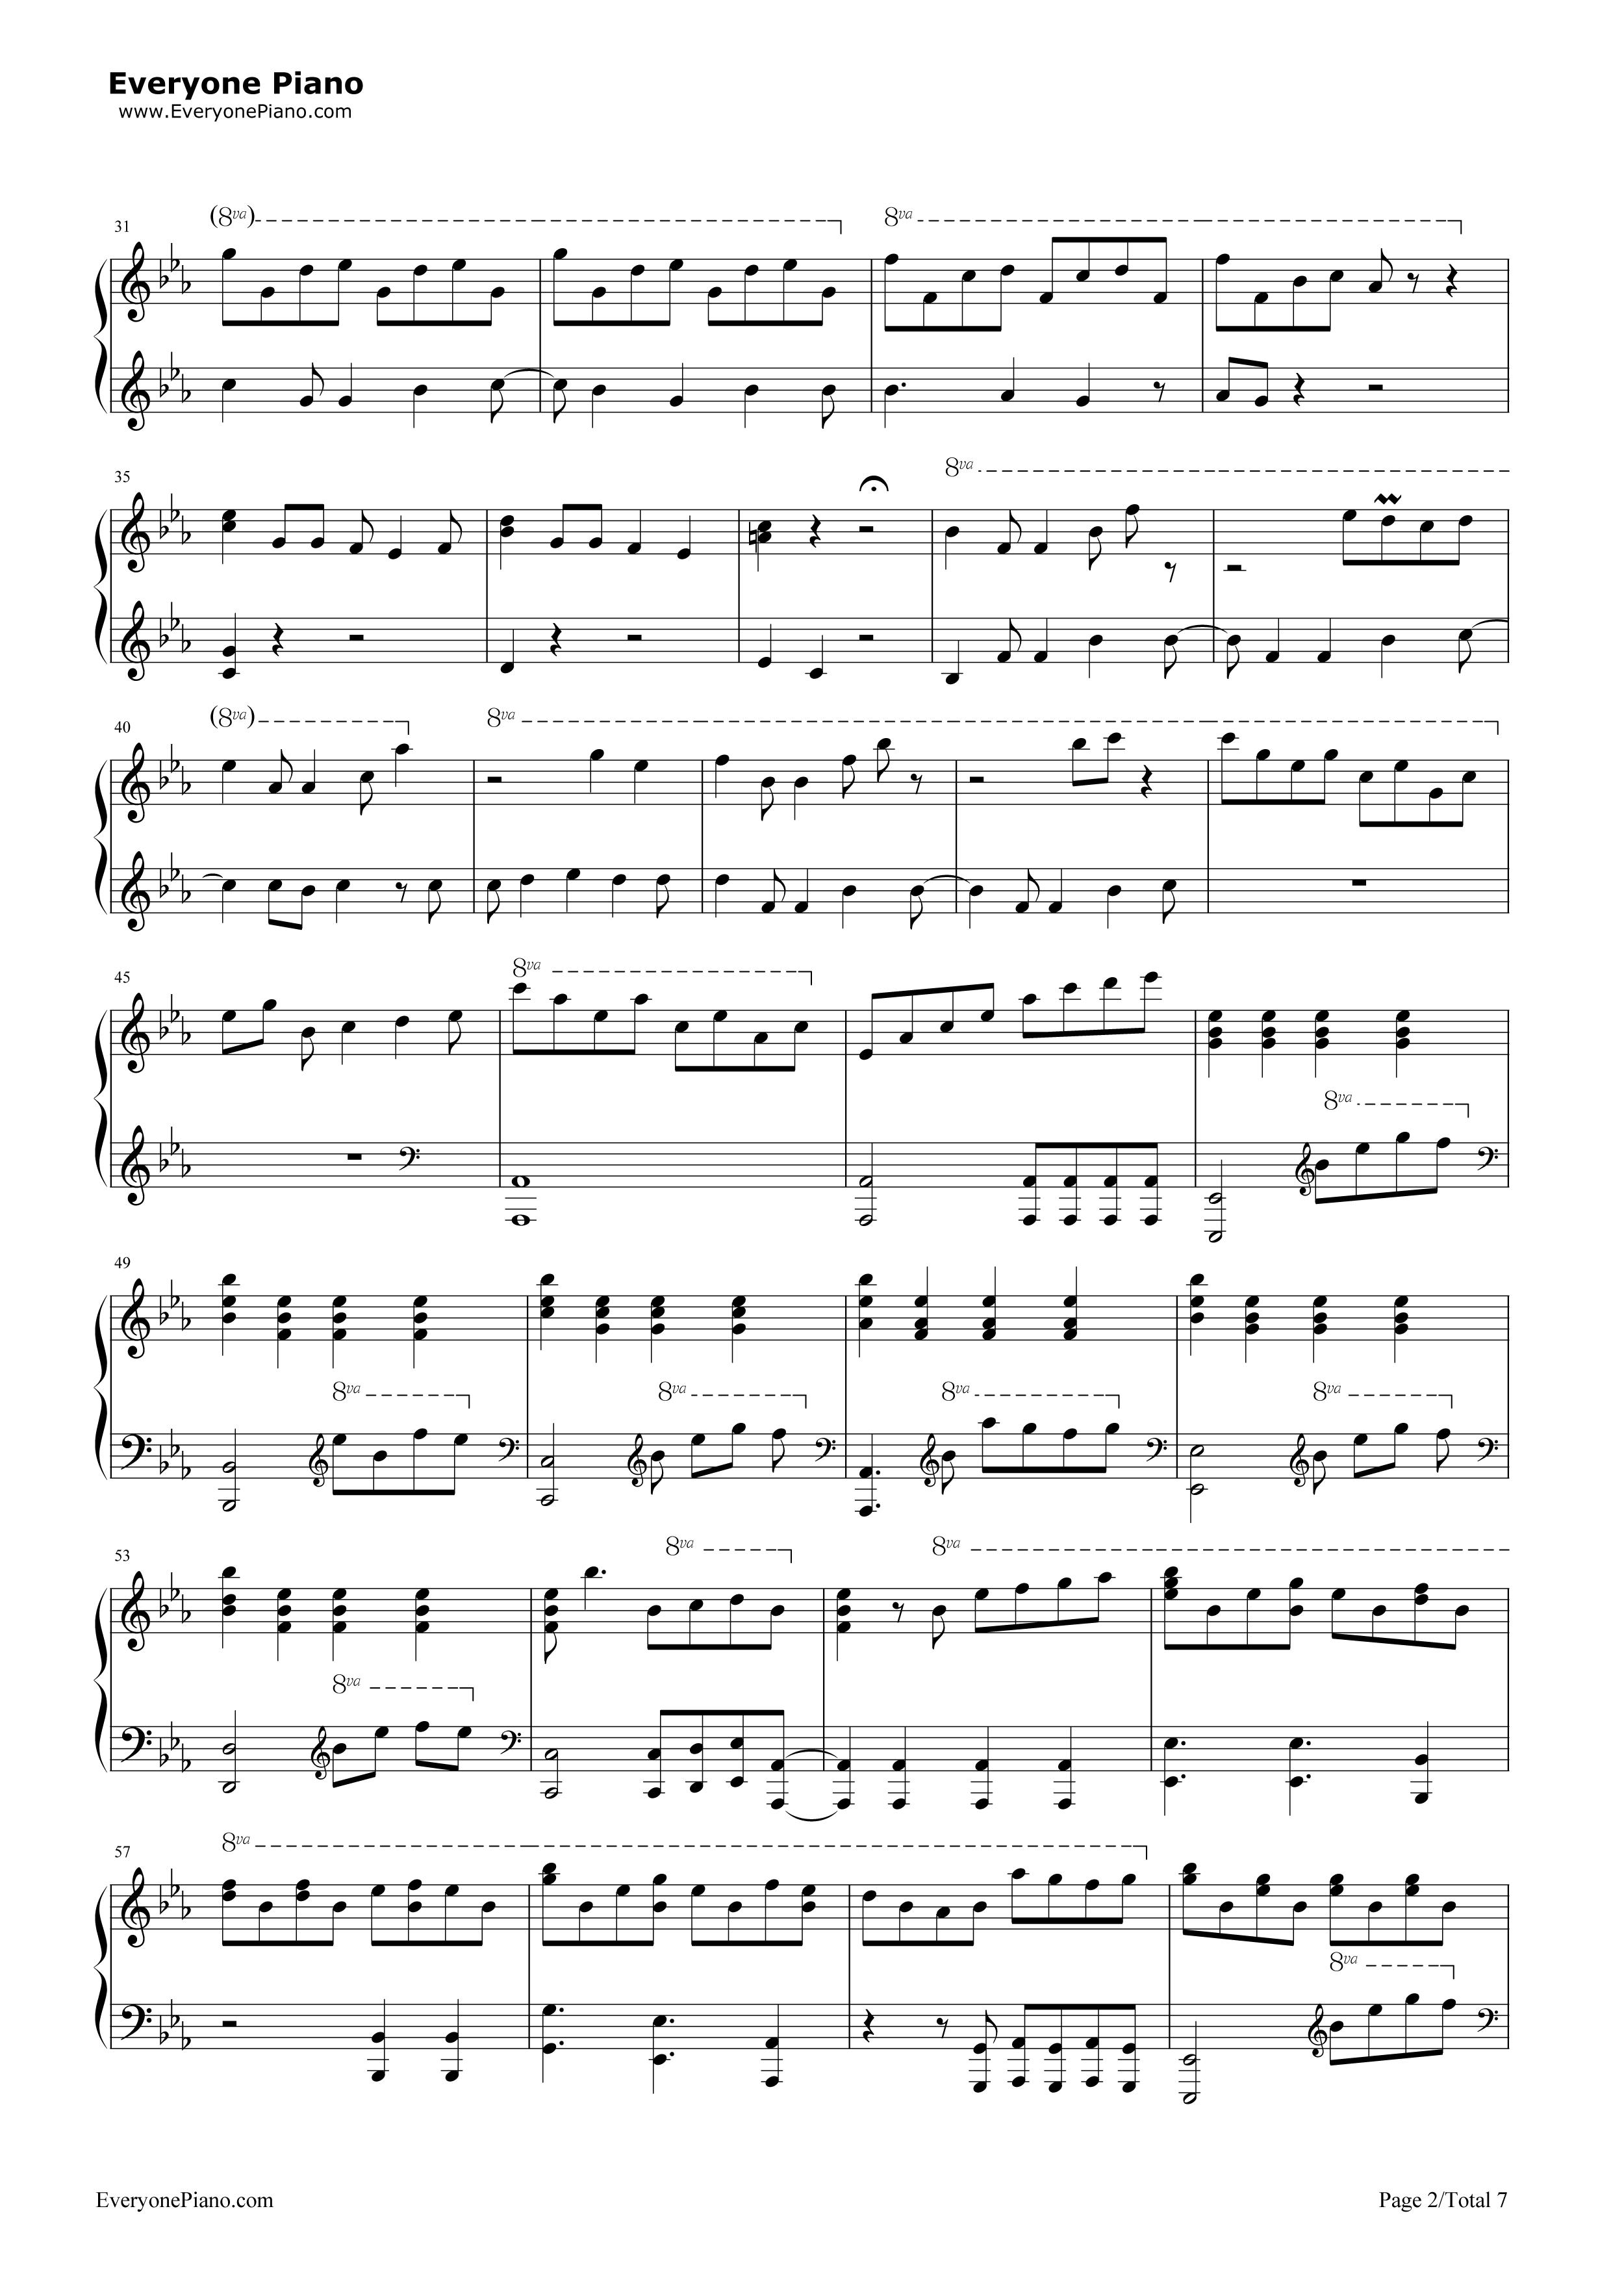 let it go伴奏-the piano guys-冰雪奇缘主题曲五线谱